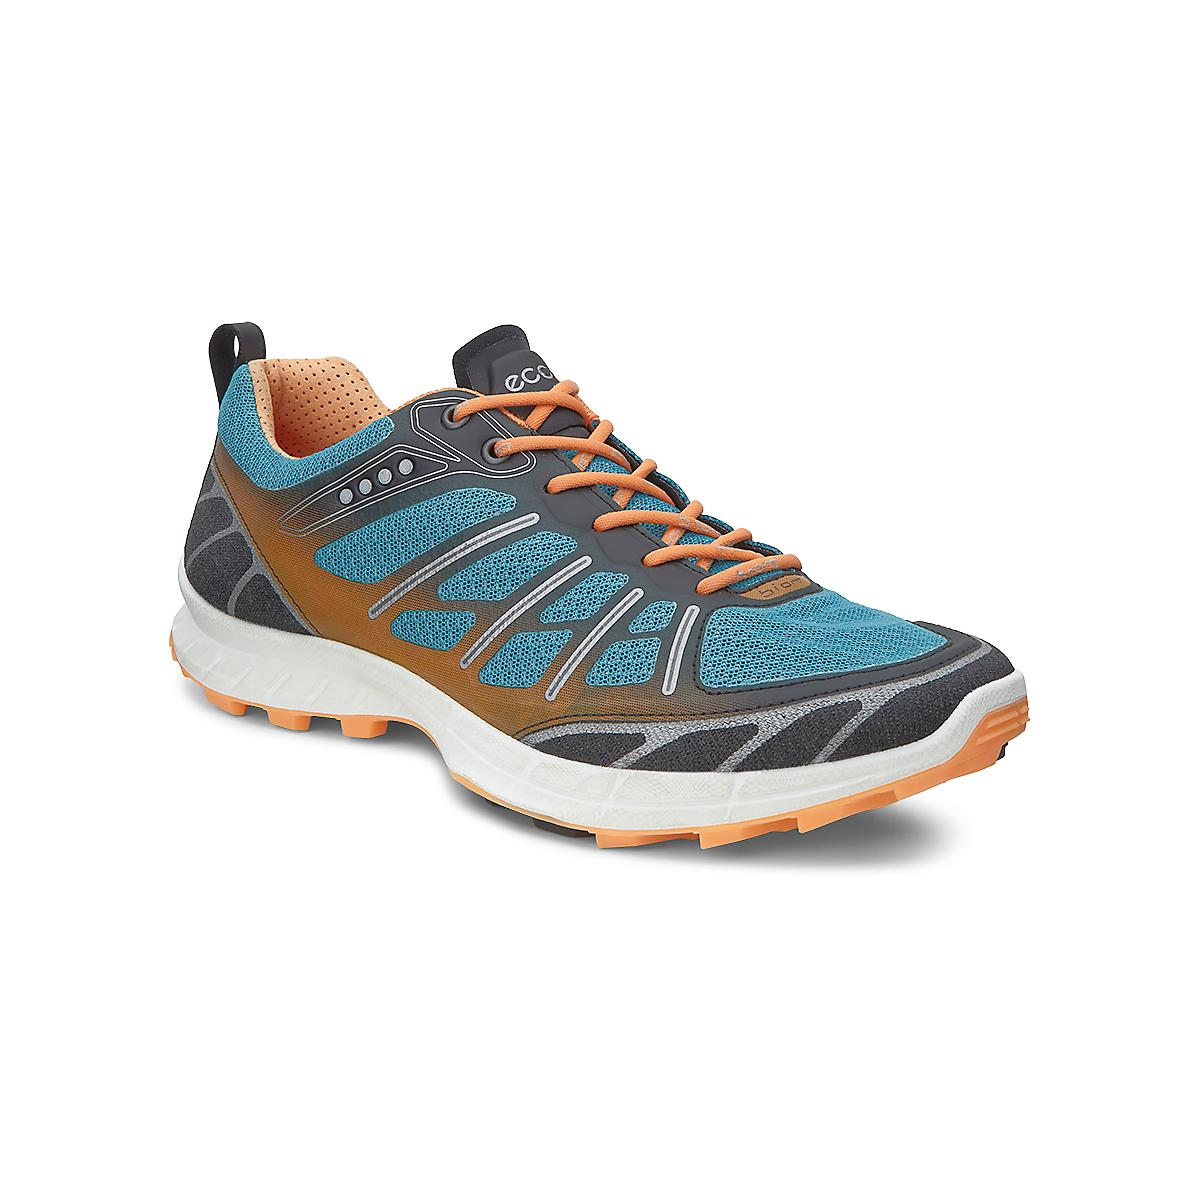 389ddf84366c87 Womens Ecco Biom FL Lite Trail Running Shoe at Road Runner Sports